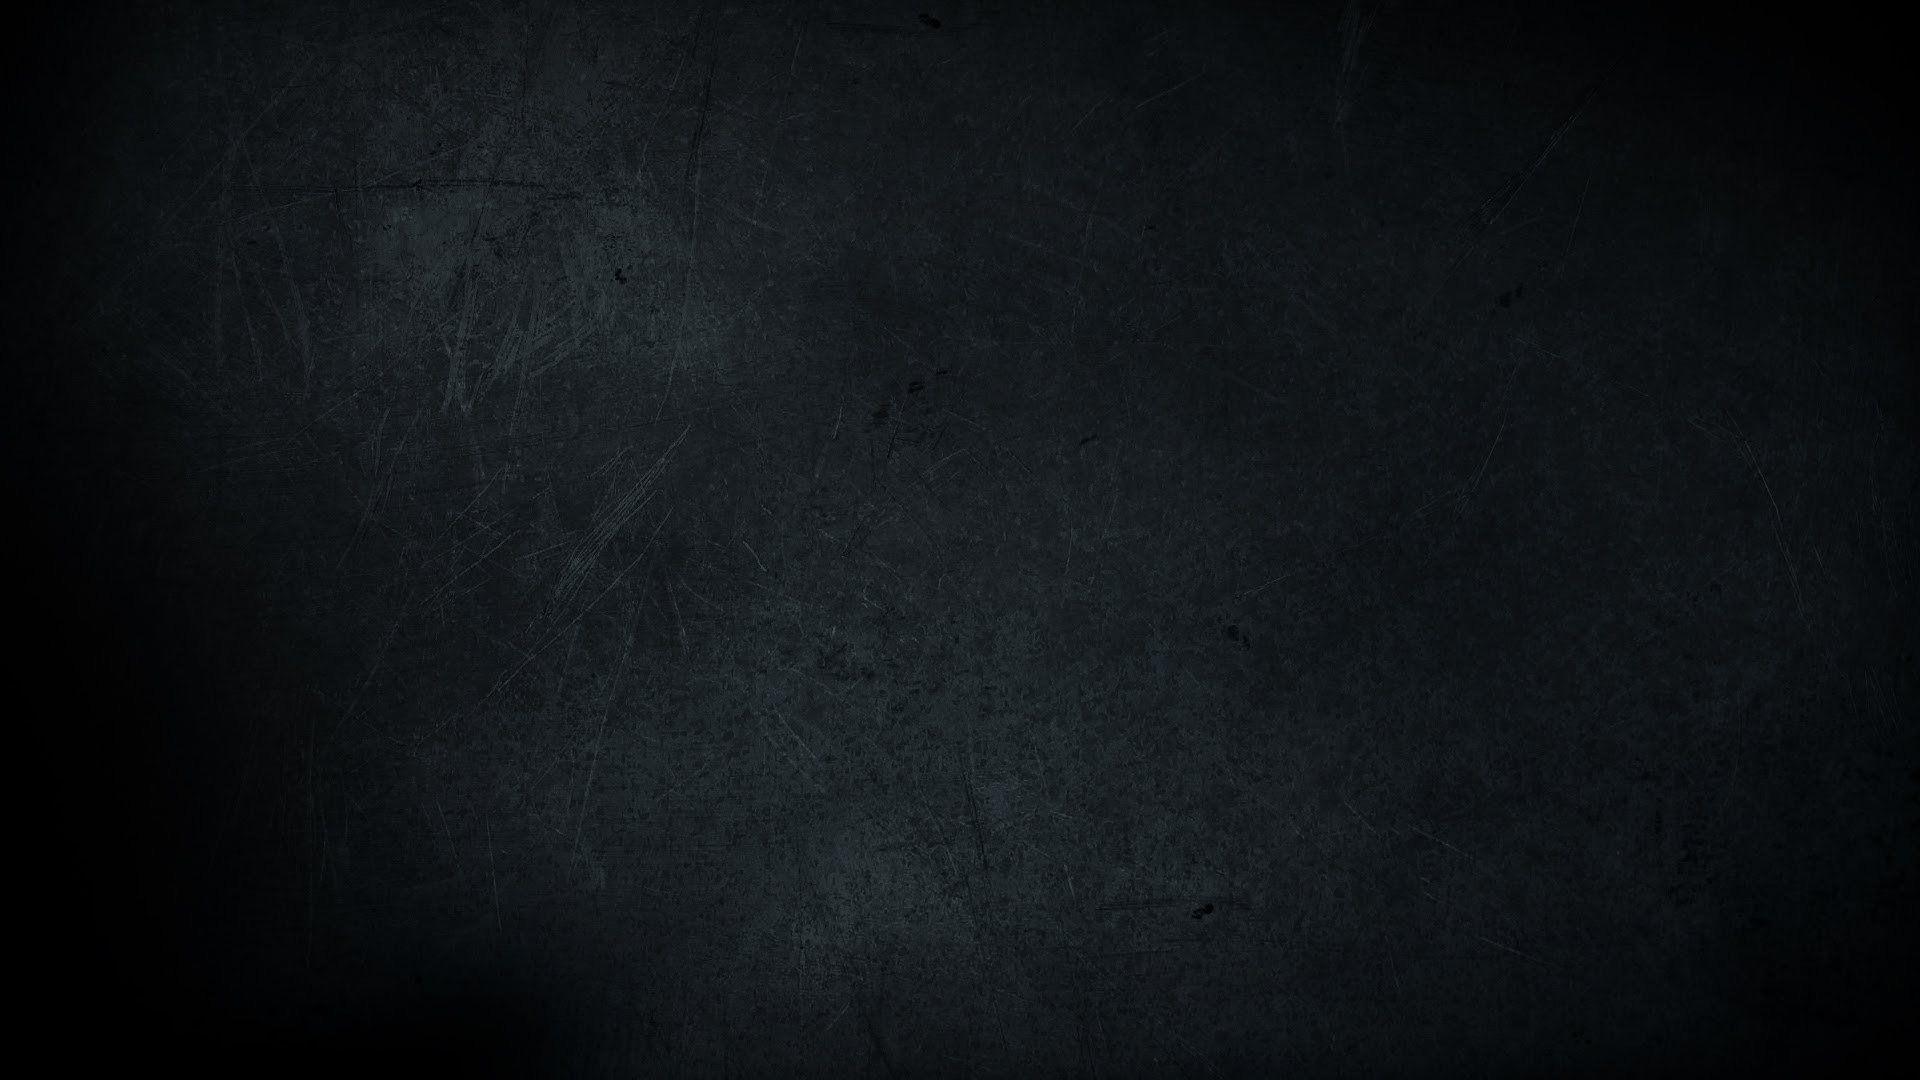 Website Background Texture hd image